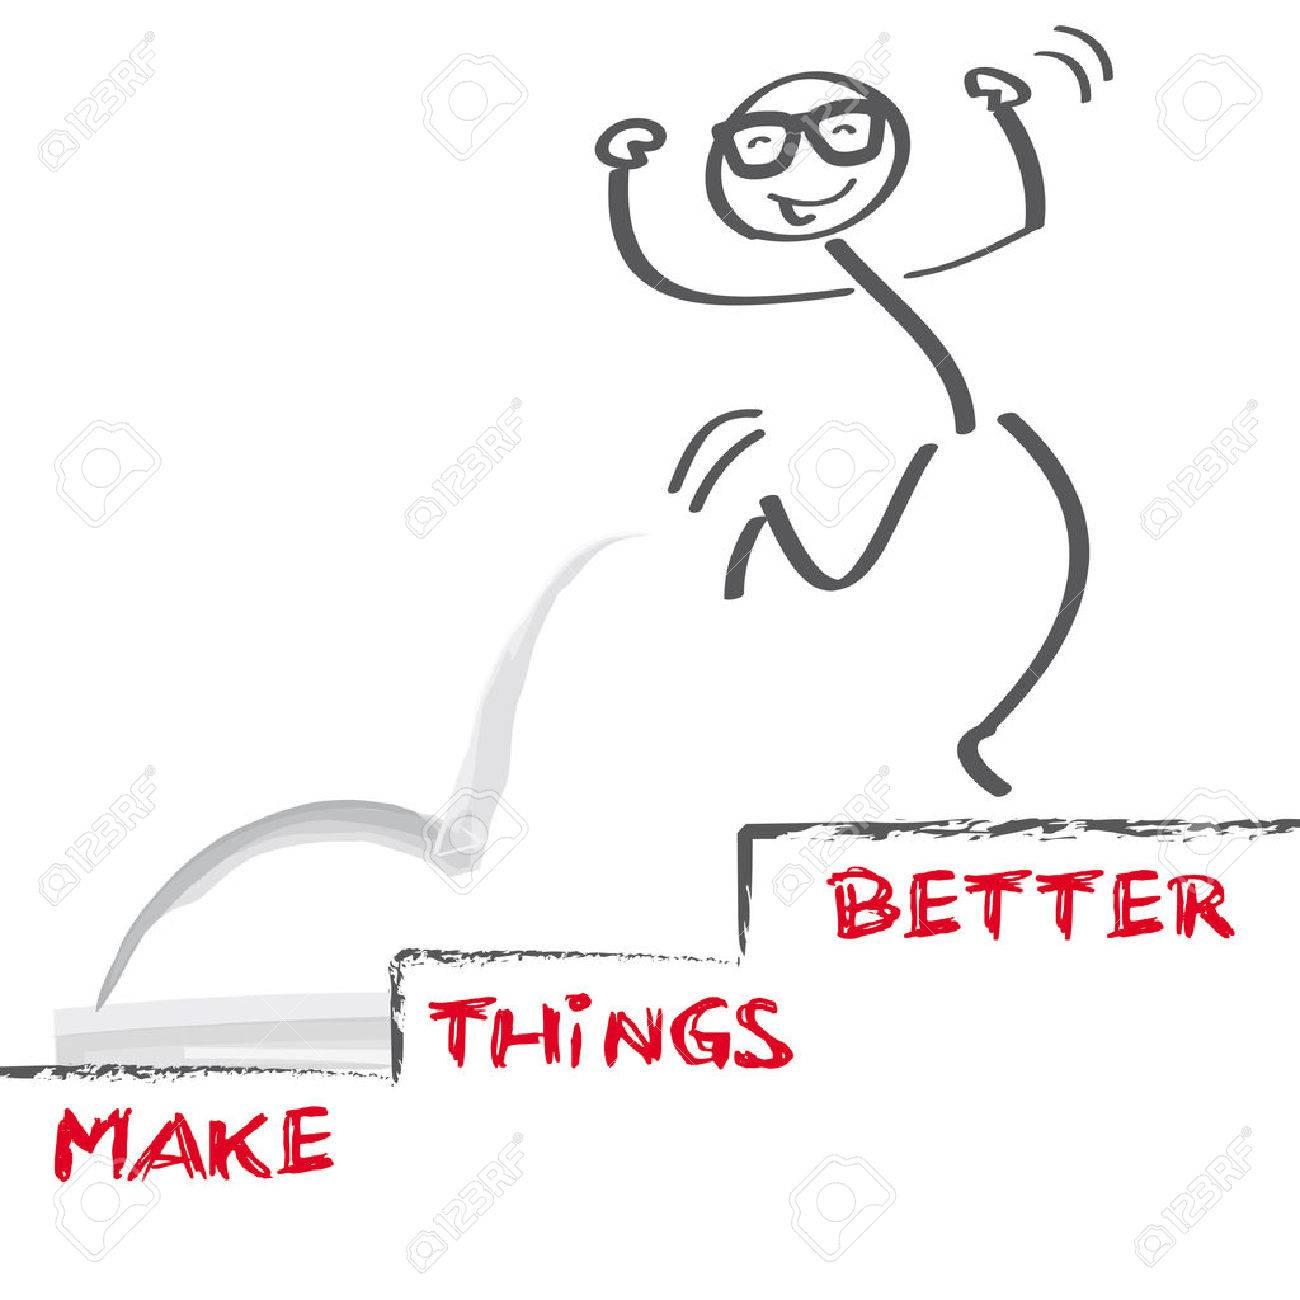 vector image make things better - 39243582